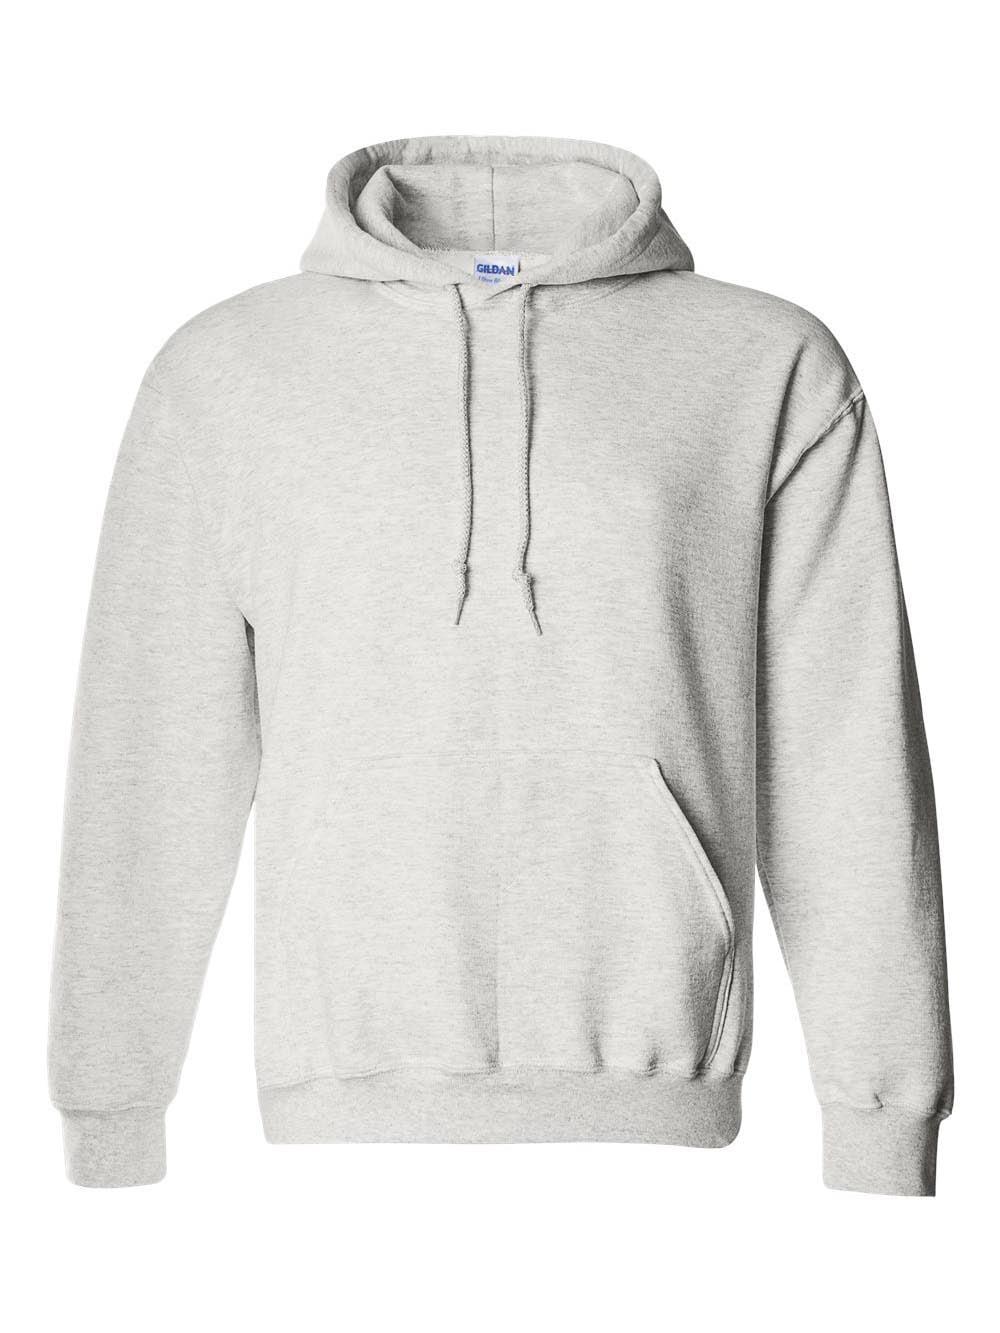 Gildan - DryBlend Hooded Sweatshirt - 12500